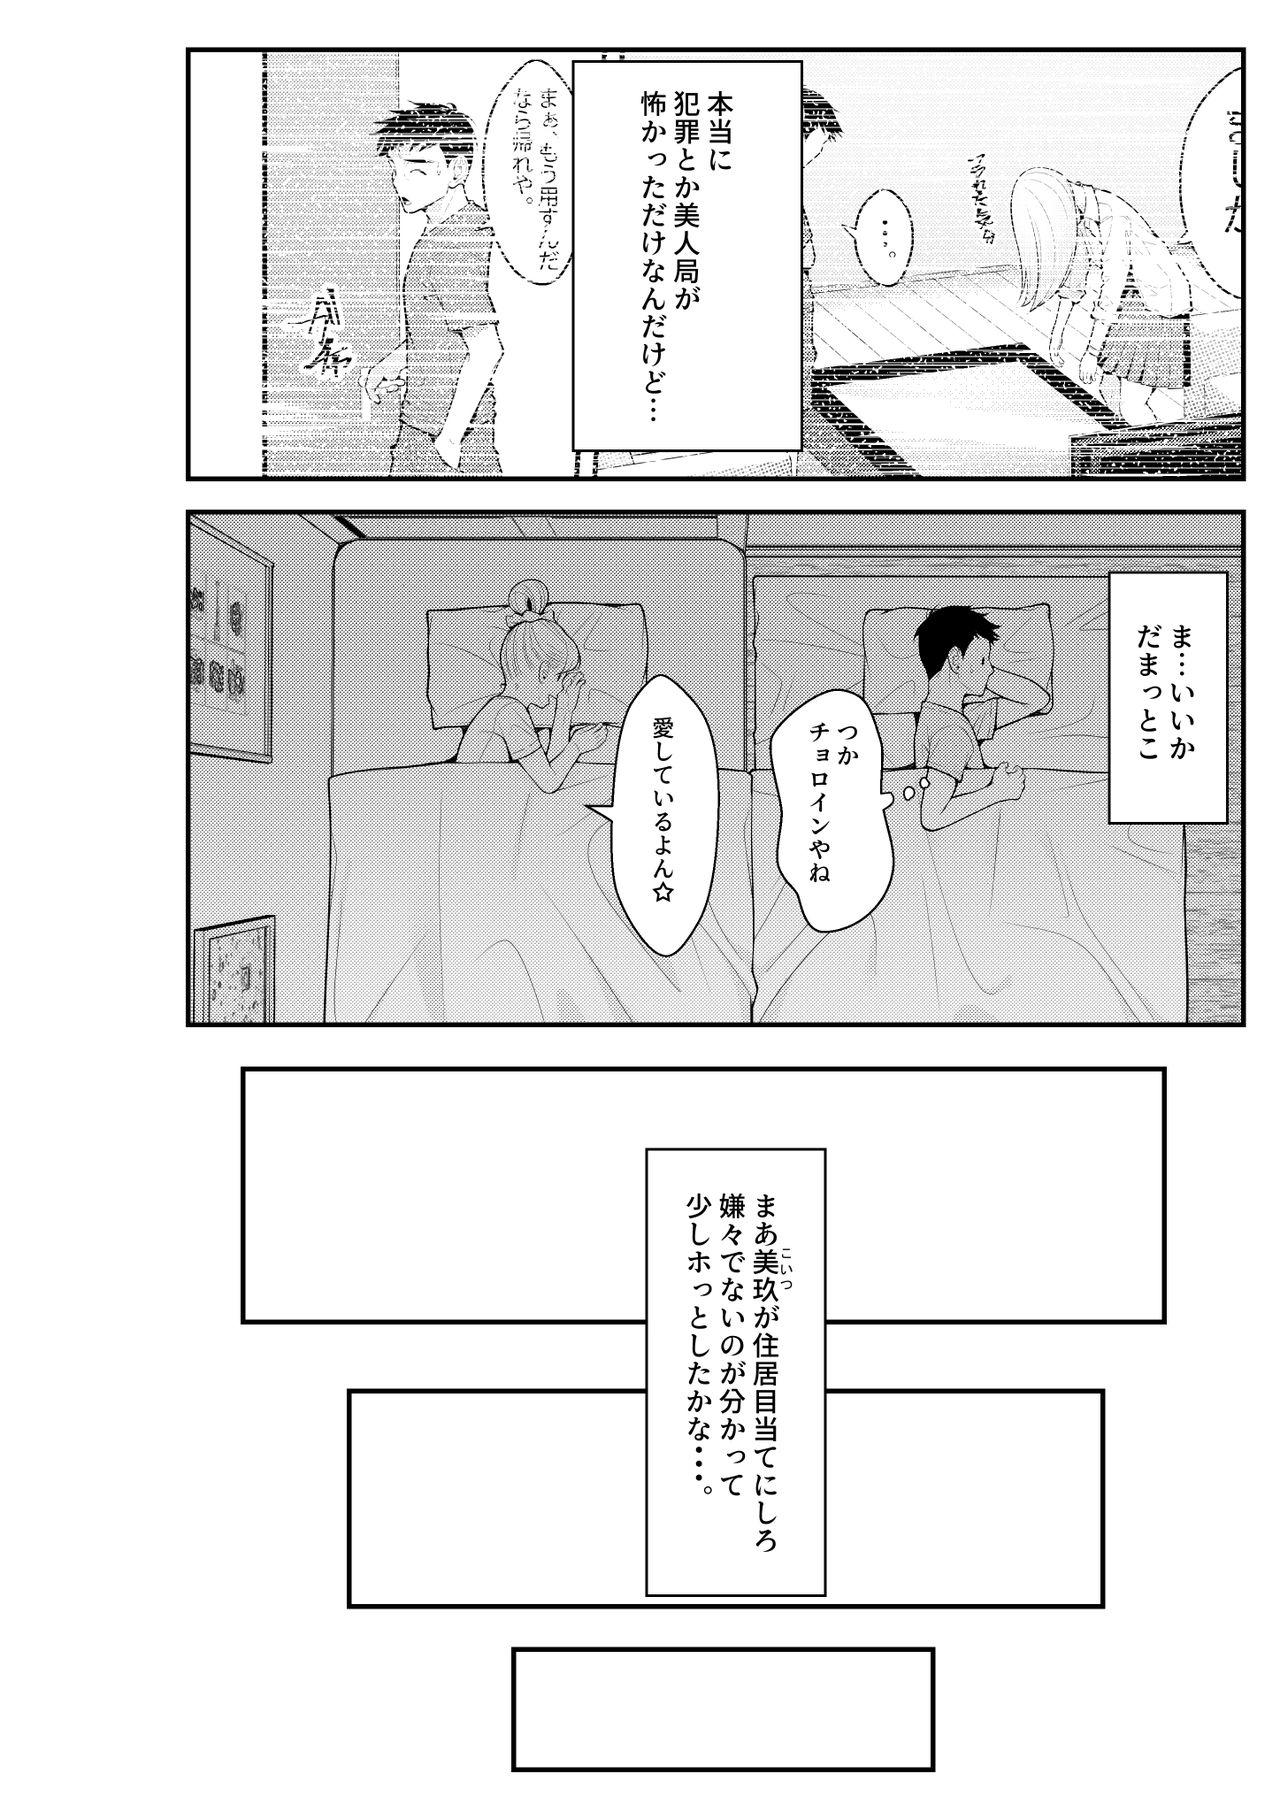 Iede Gal o Hirottara Harem ni Natta Hanashi 43